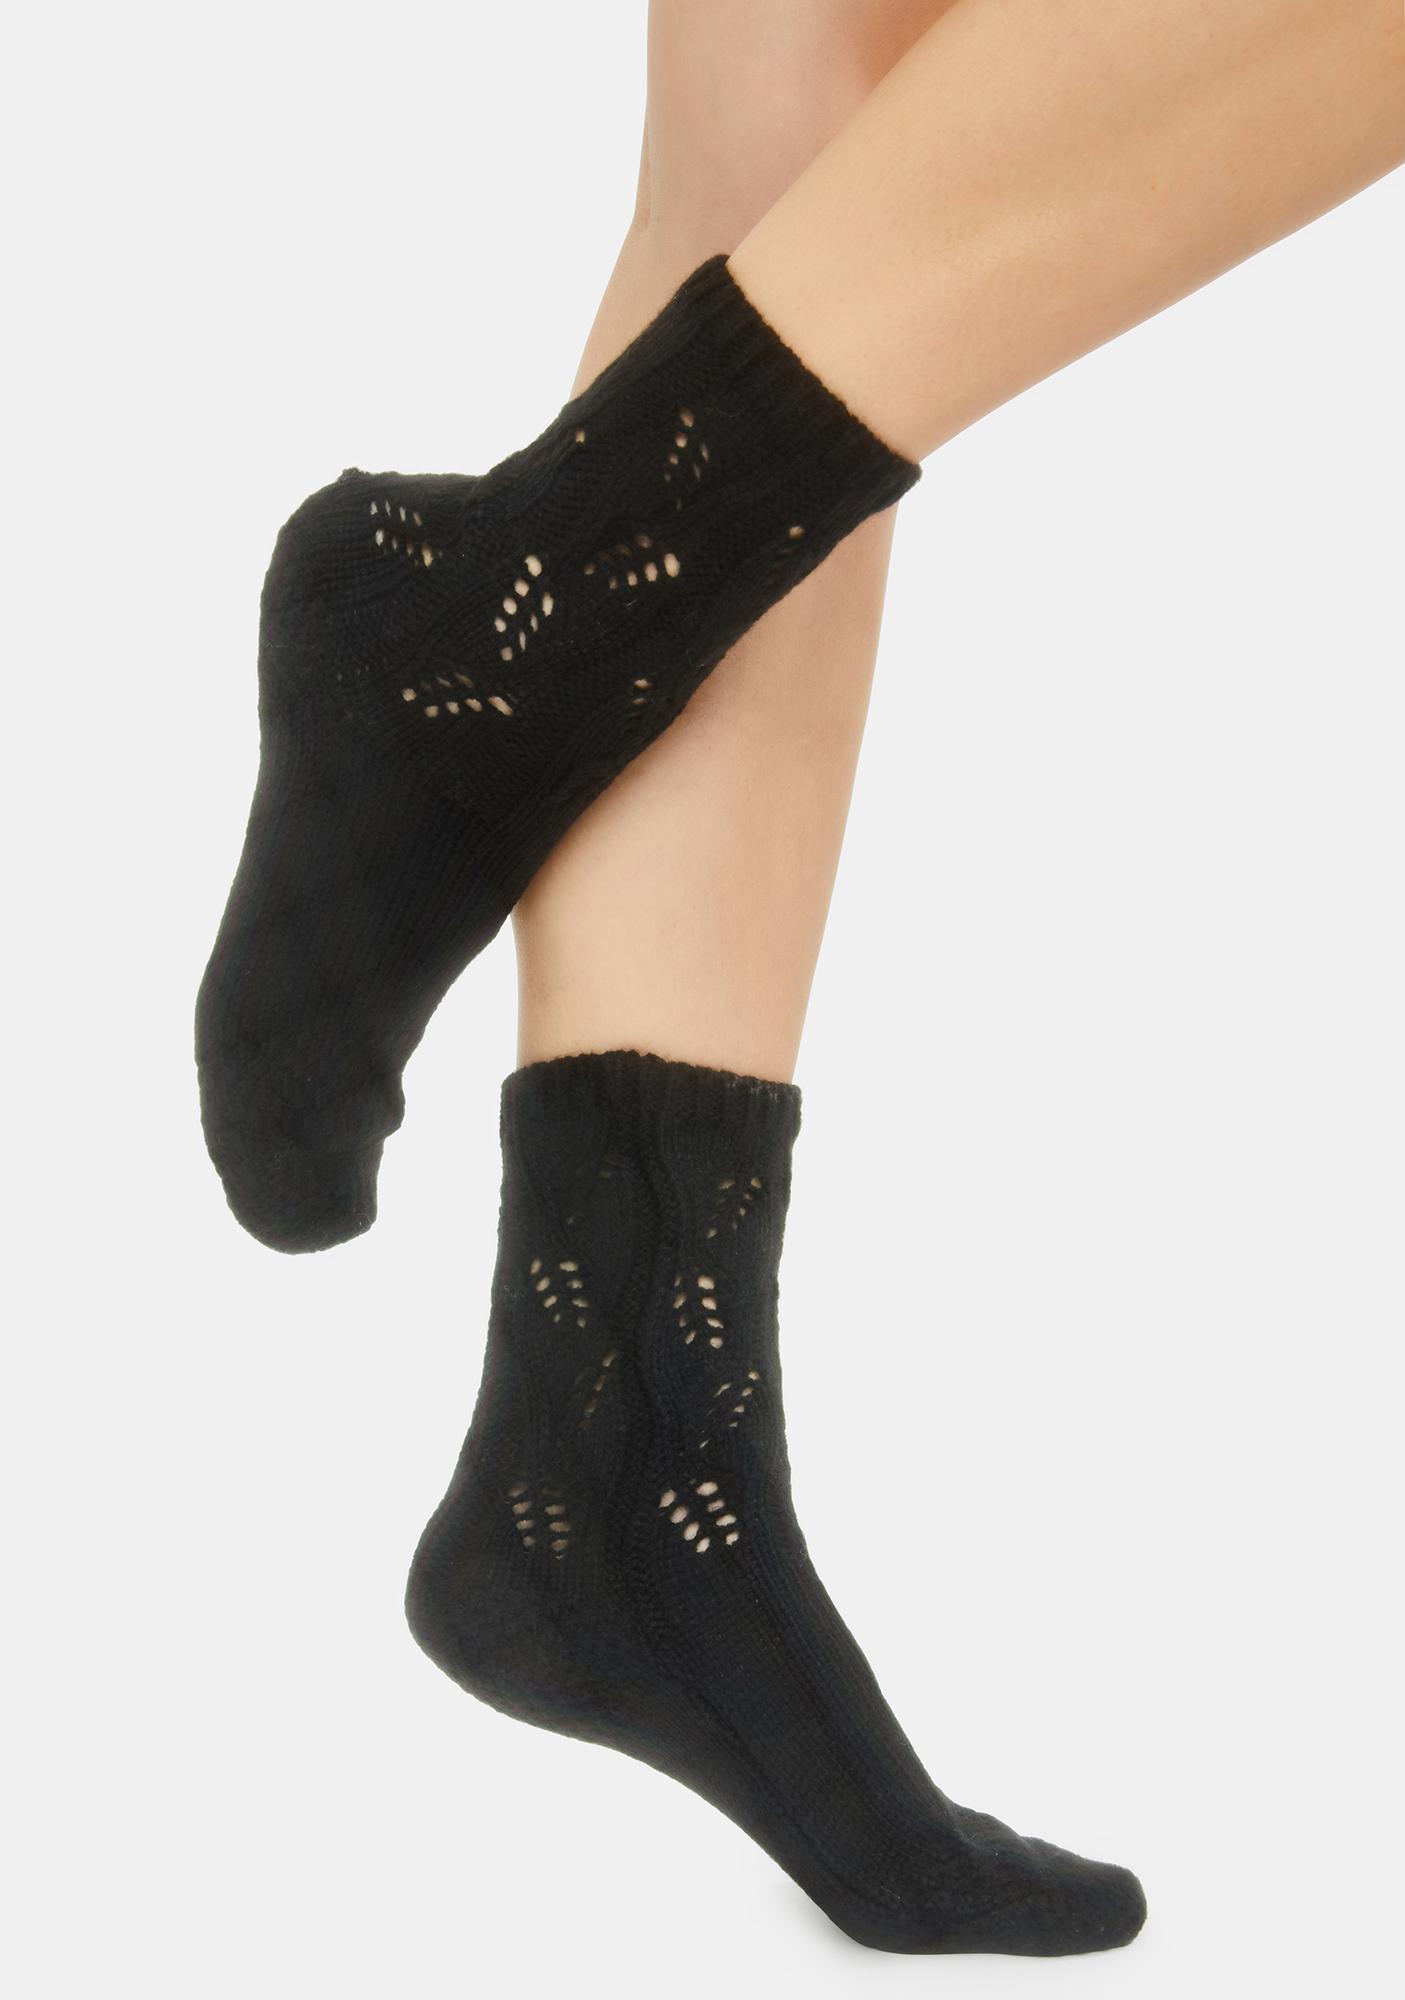 MeMoi Night No Place Like Home Pointelle Crew Socks